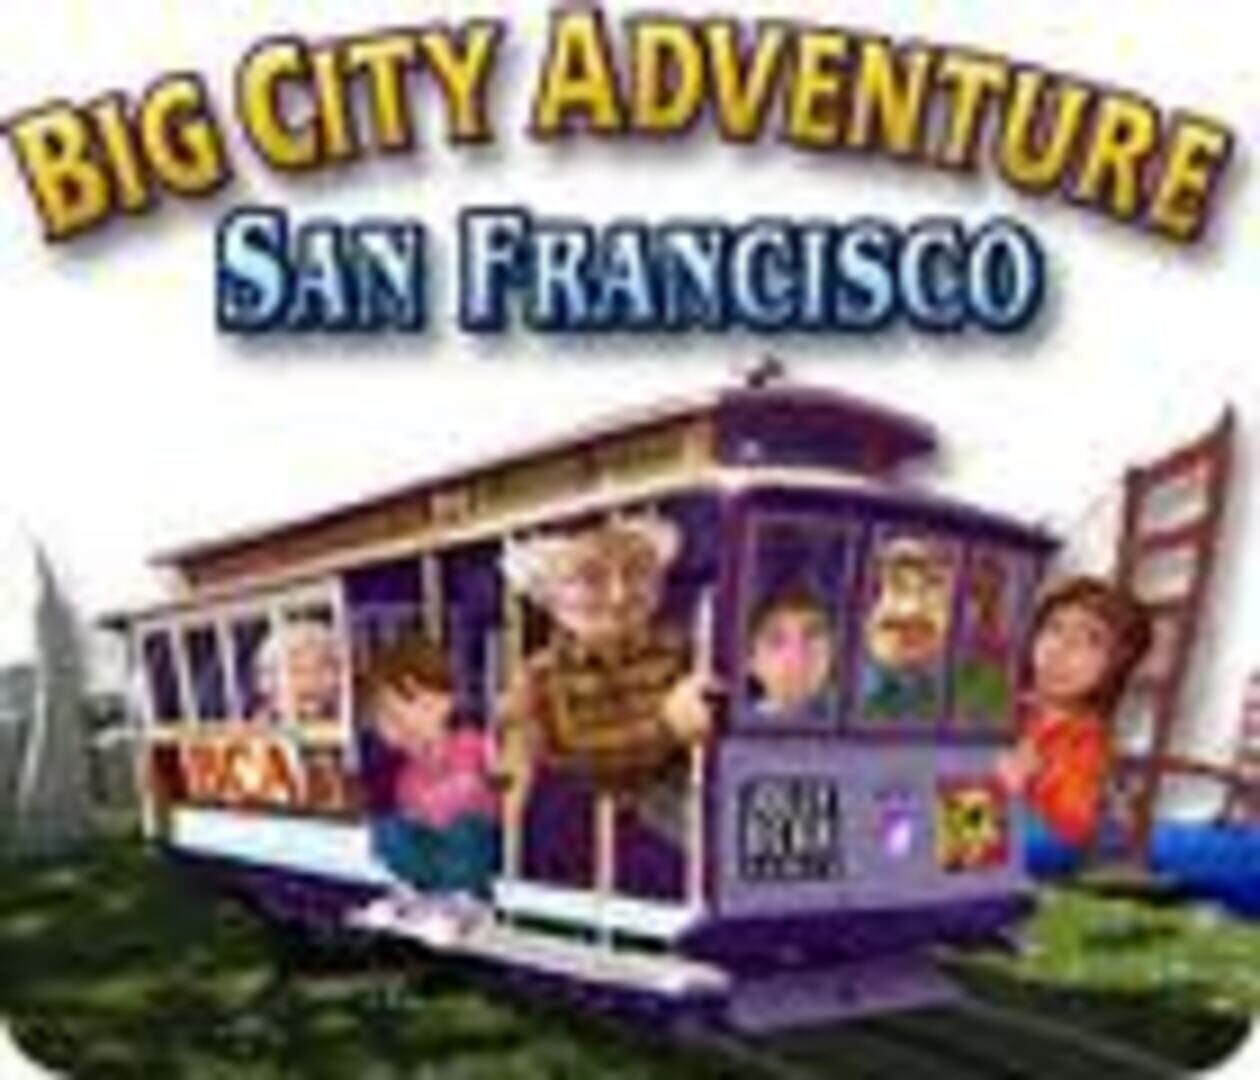 buy Big City Adventure: San Francisco cd key for all platform